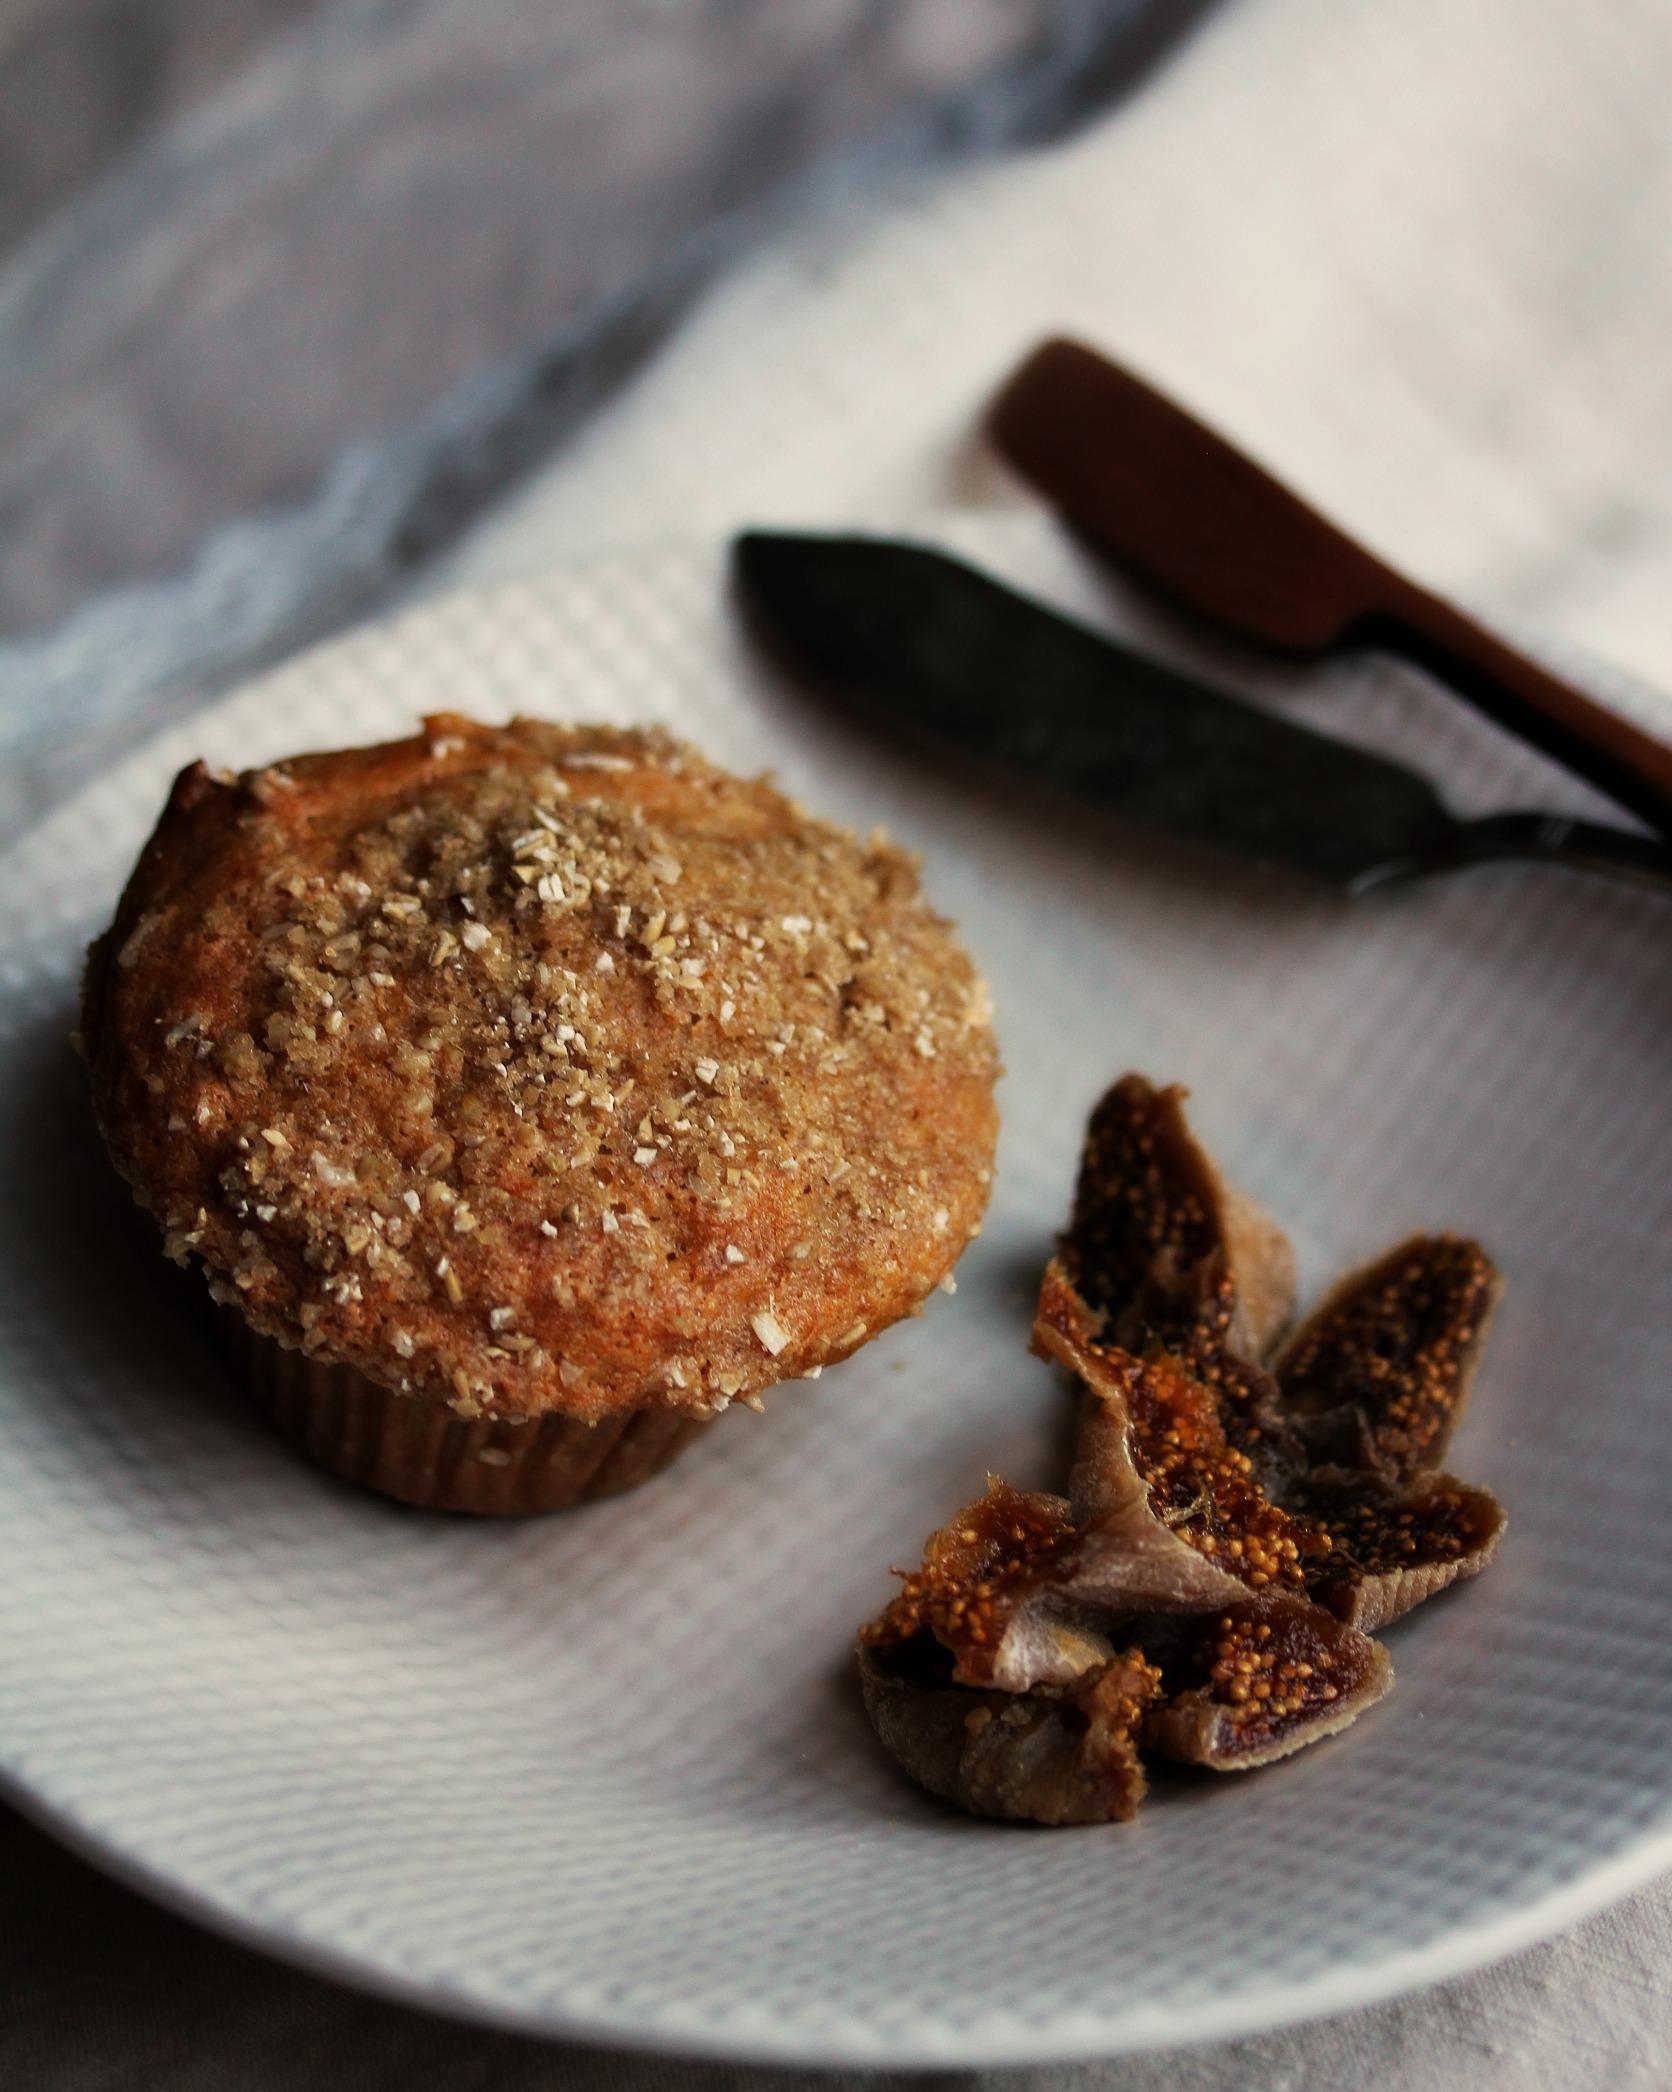 ©Sweet Potato Muffins by Dena T Bray